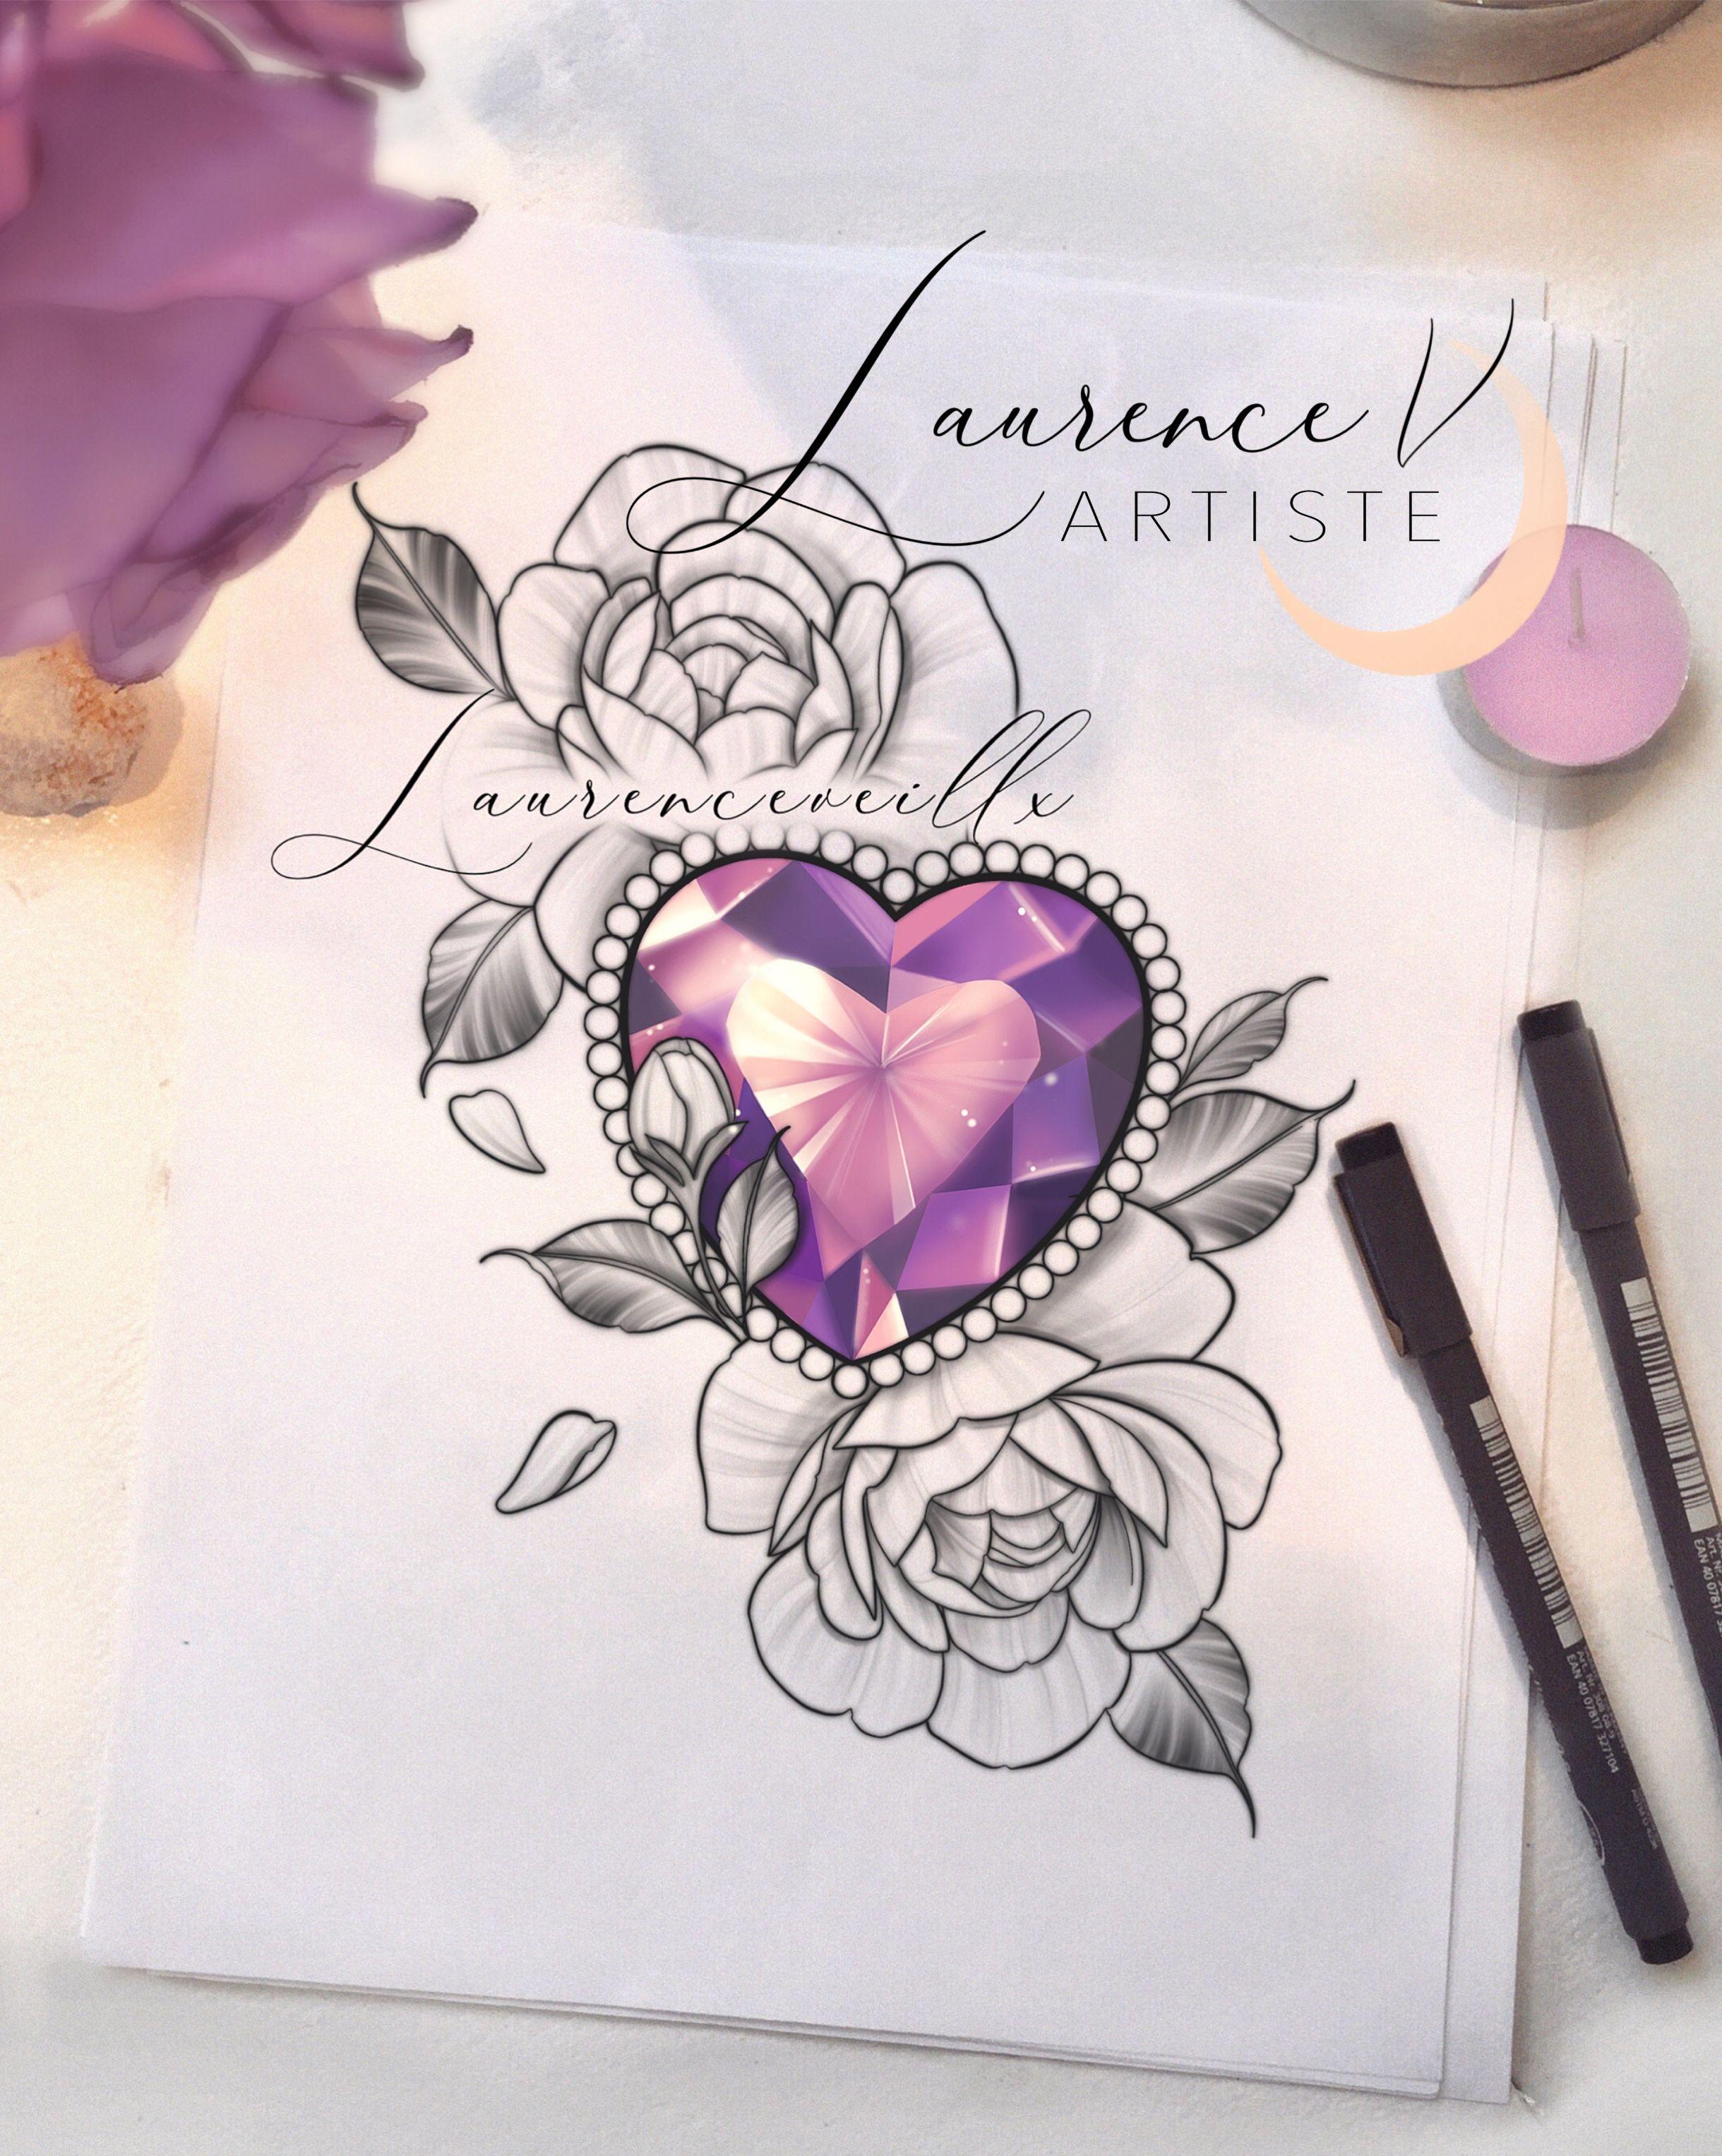 Printable Tattoo Design Instant Download Tattoo Design Pink Diamond And Flowers Tattoo Thigh Tattoo Custom Tattoo Drawing For Women In 2021 Diamond Tattoo Designs Flower Thigh Tattoos Gem Tattoo